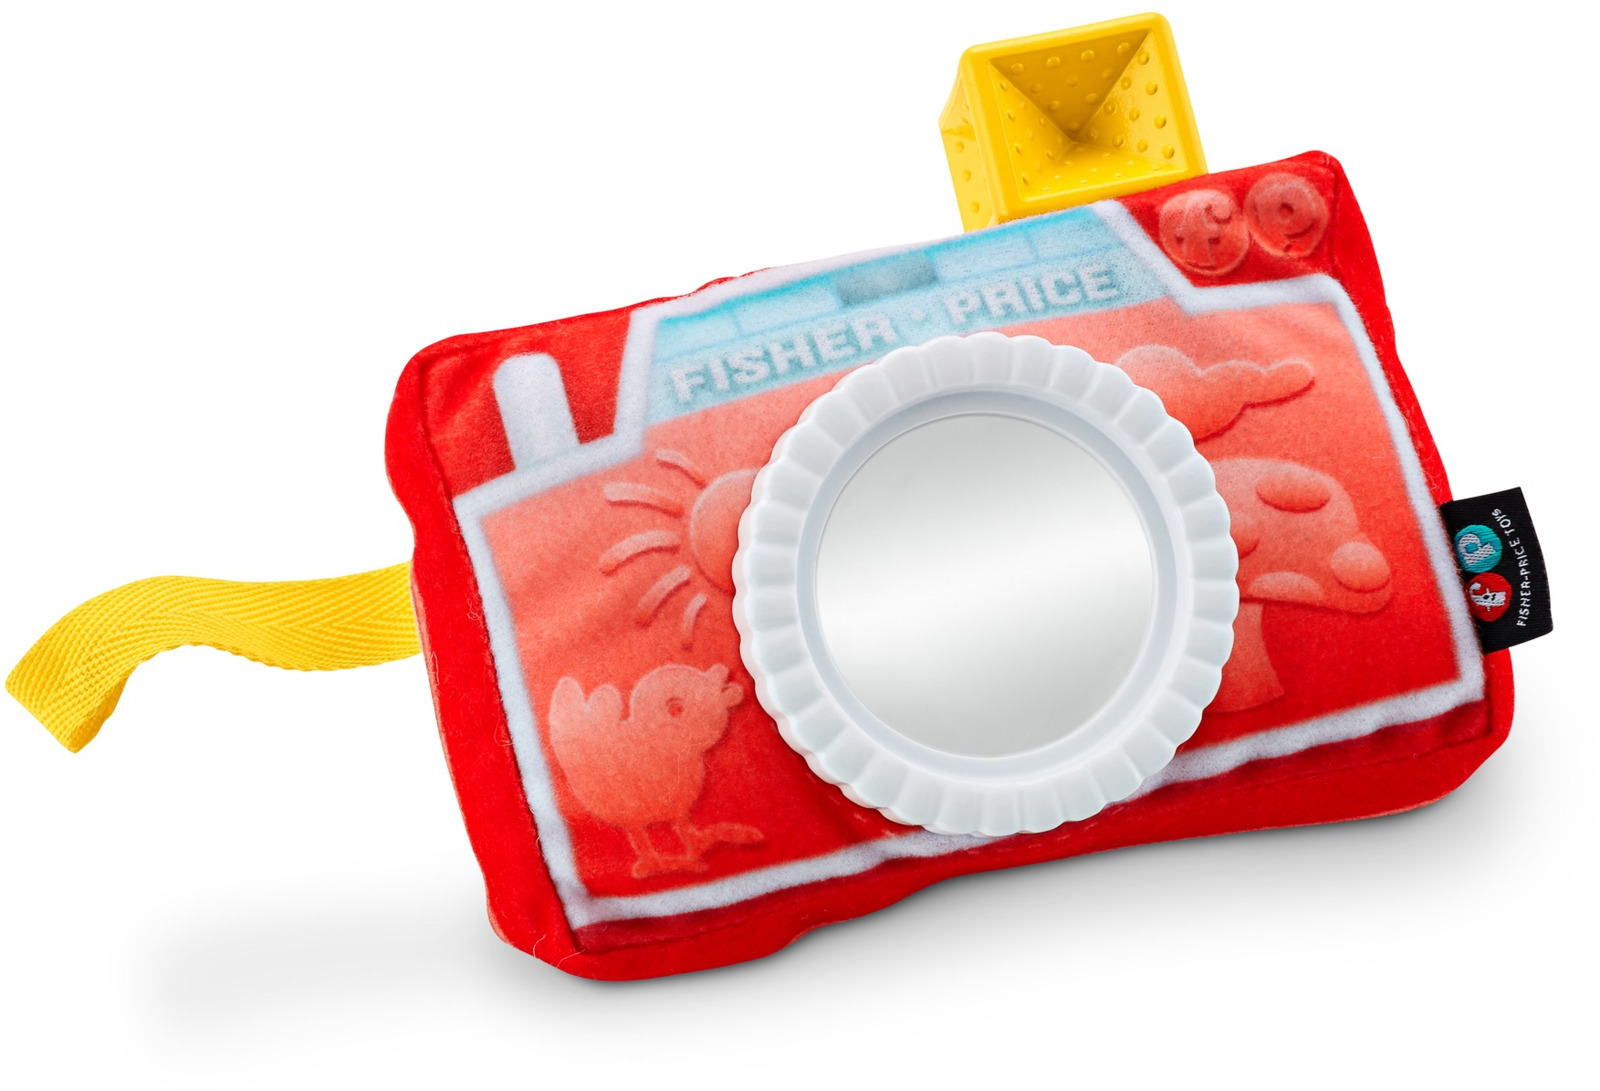 Fisher-Price Newborn Развивающая игрушка Фотоаппарат с зеркальцем